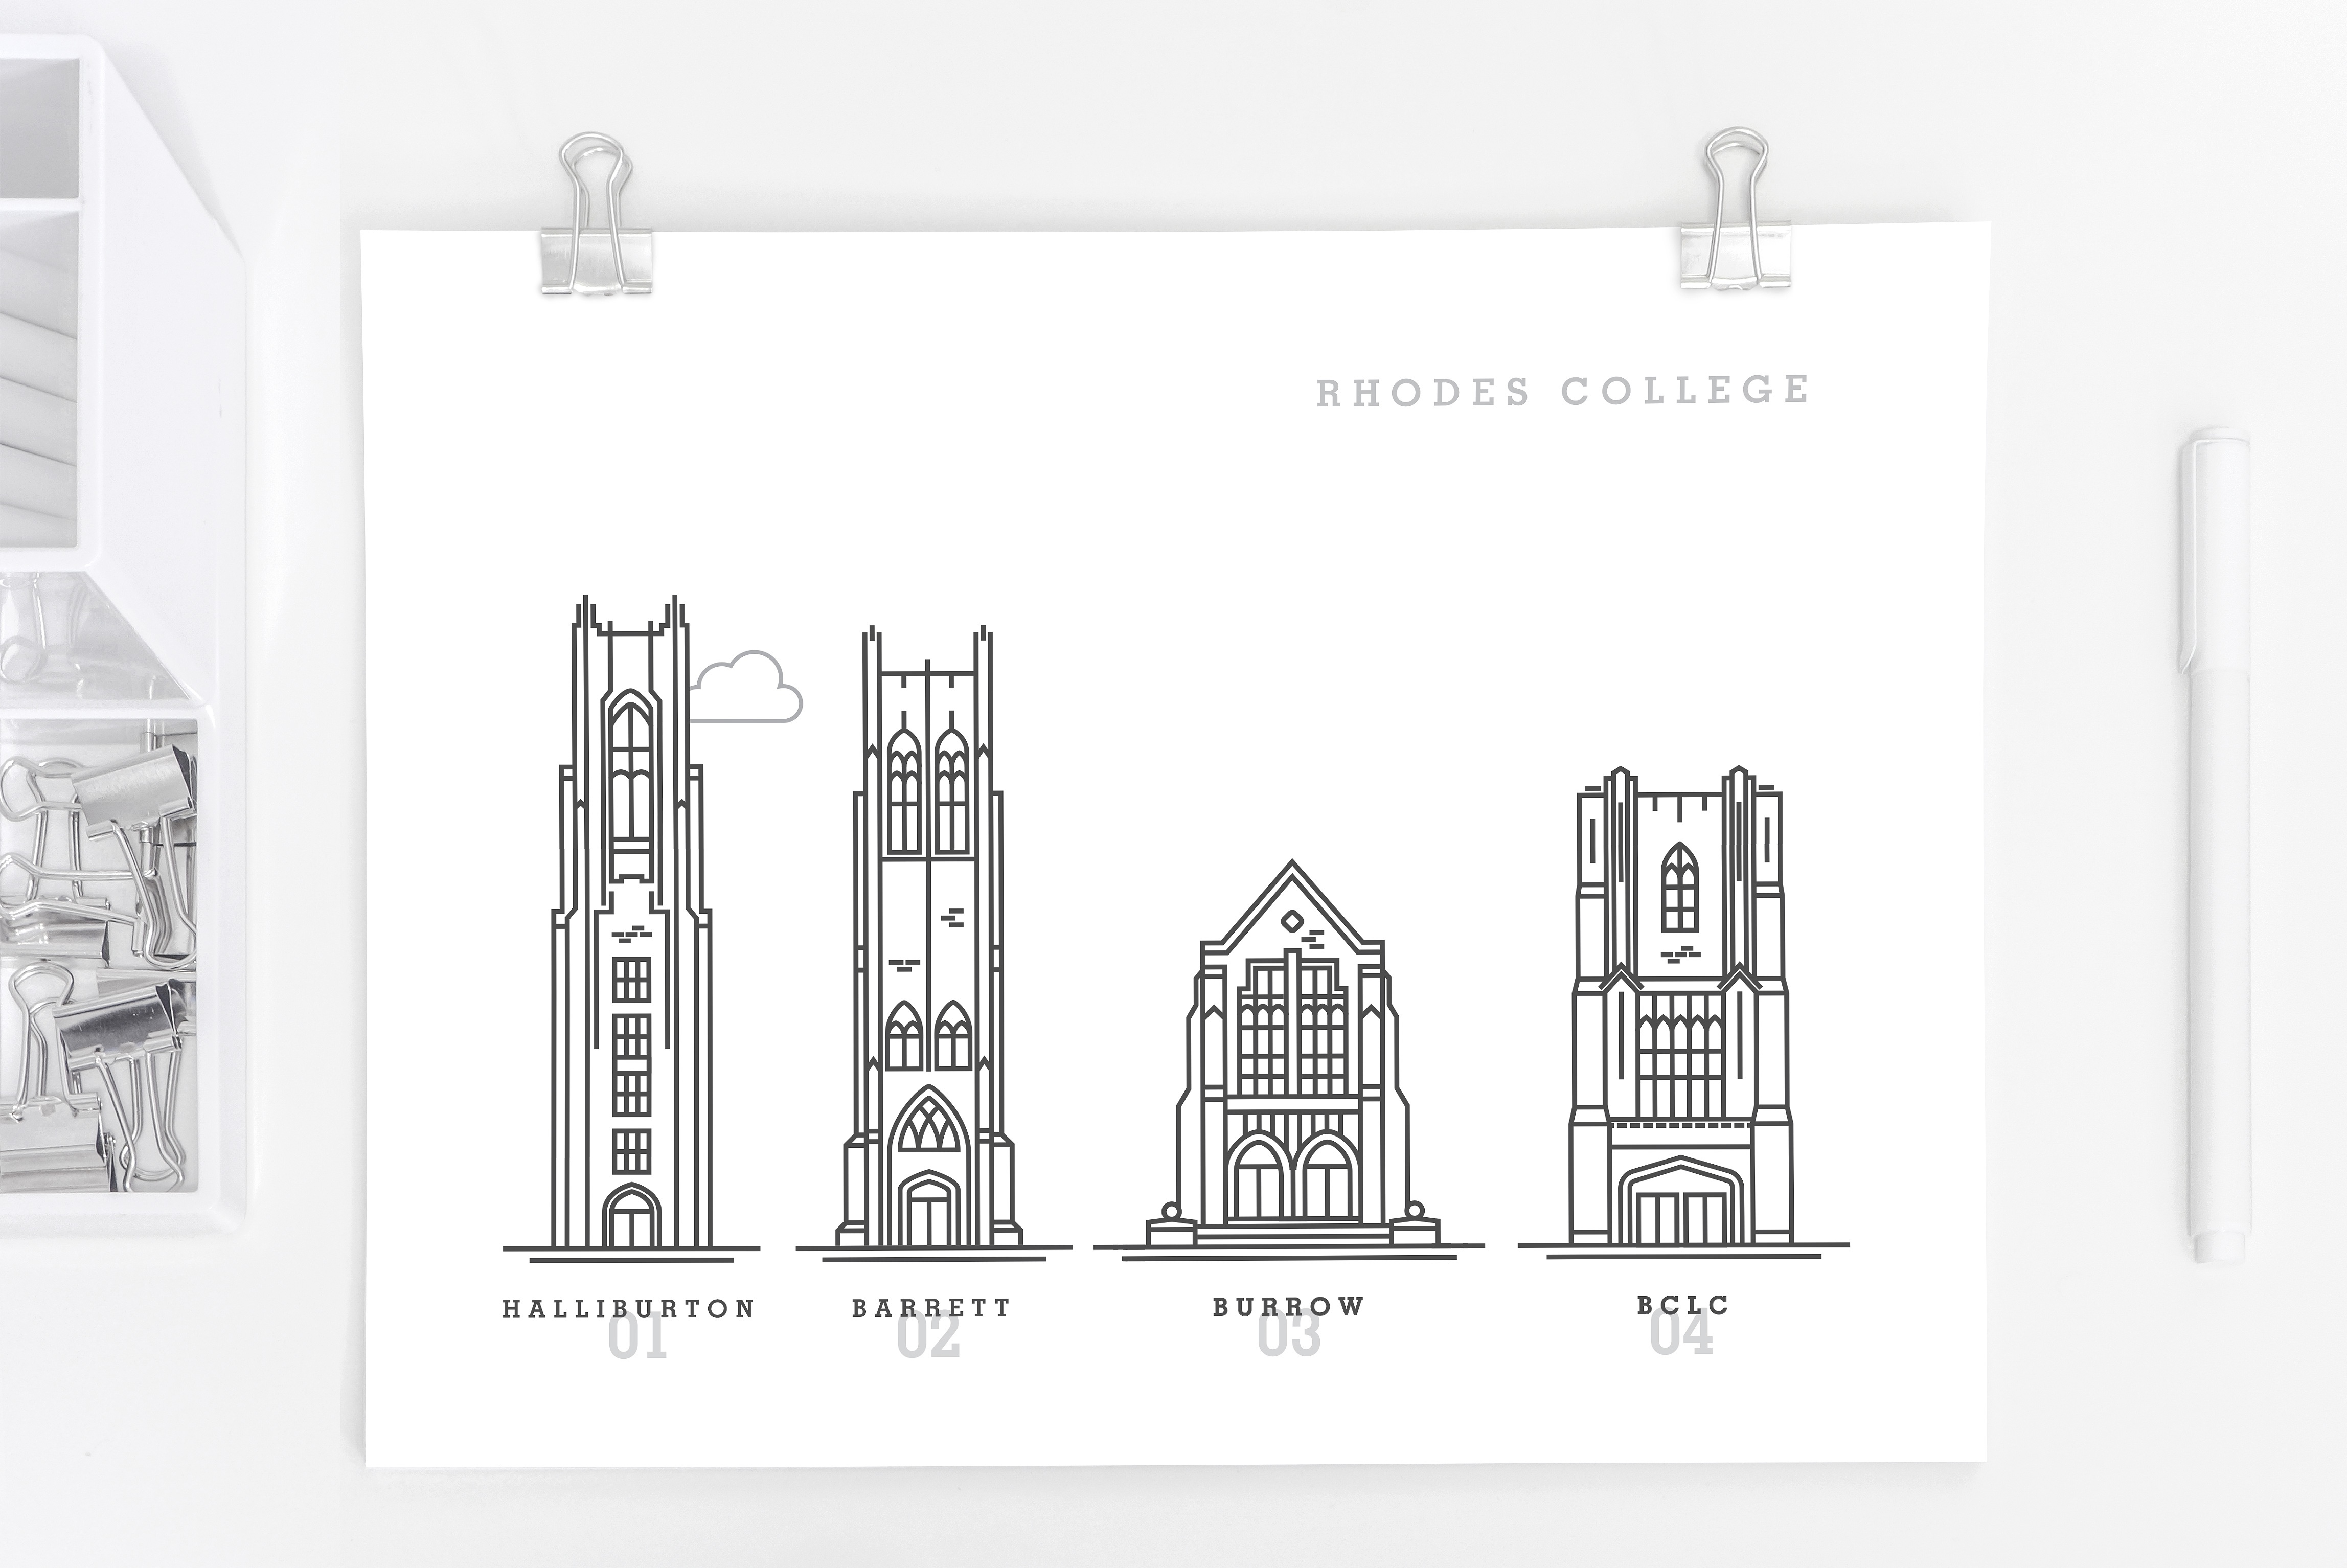 Rhodes bldgs mockup